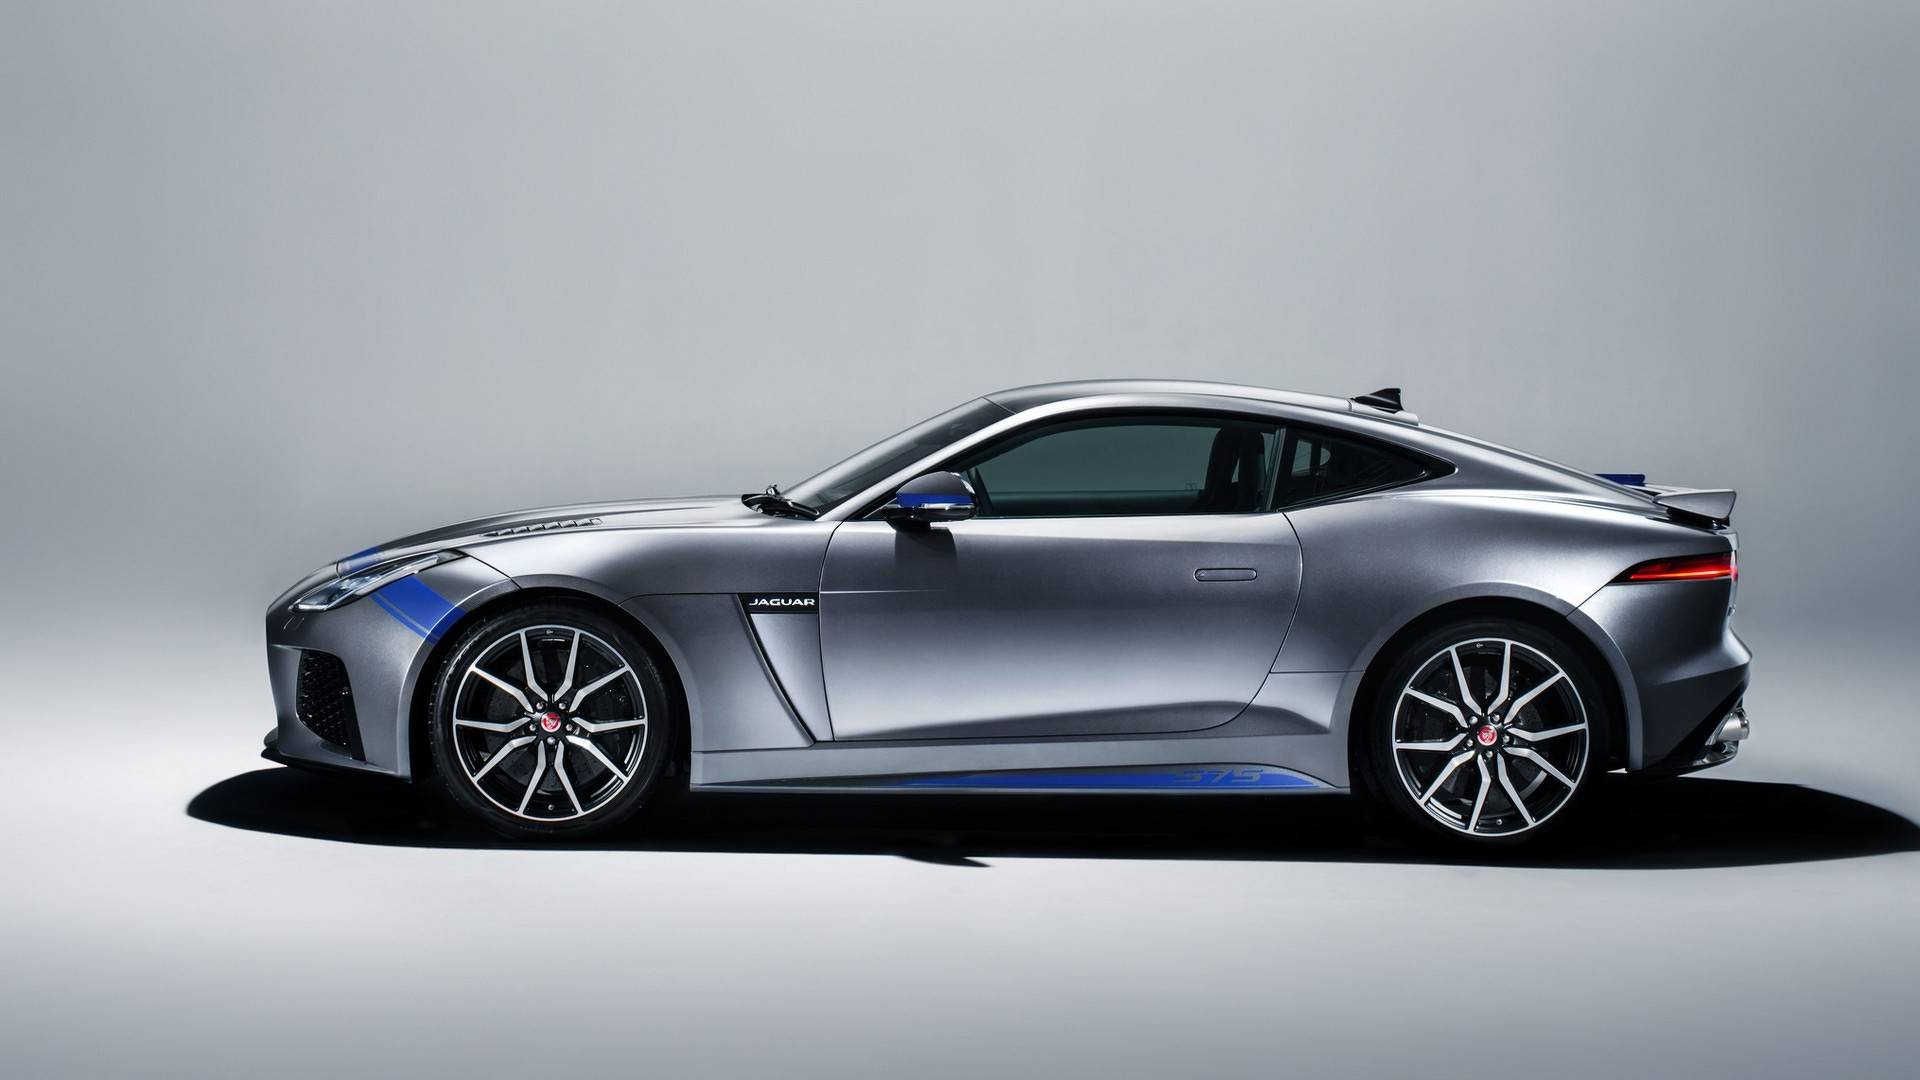 2020 Jaguar F-Type Toronto